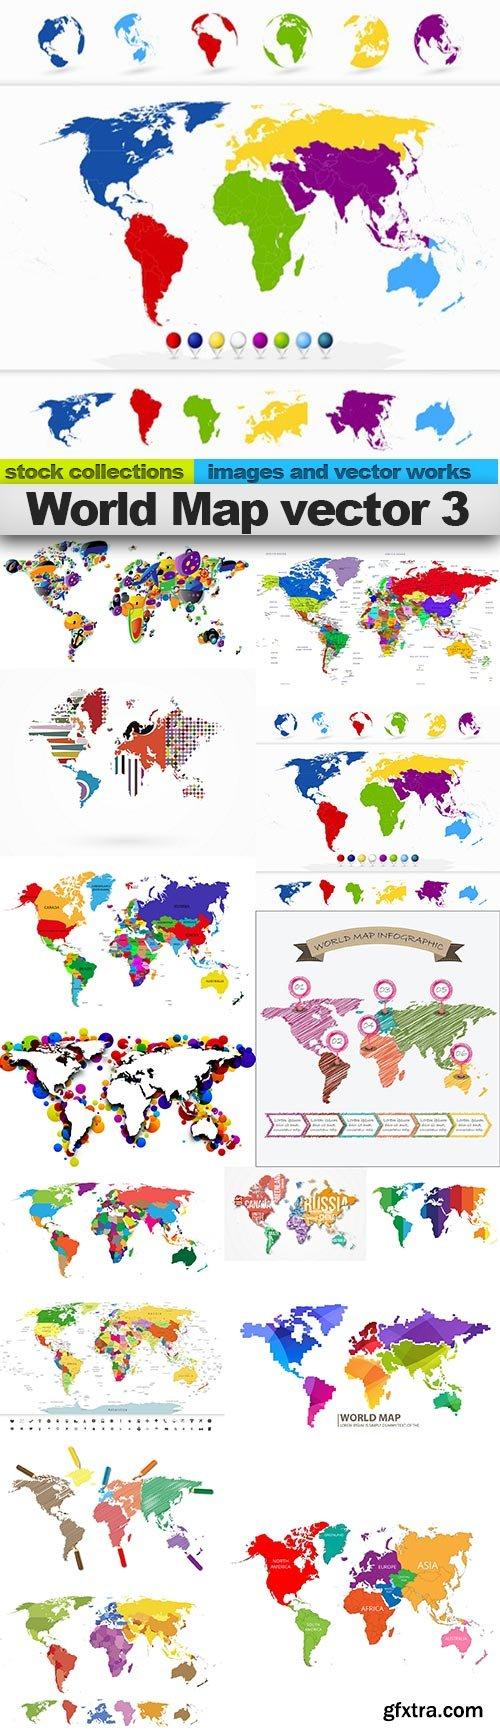 World Map vector 3, 15 x EPS